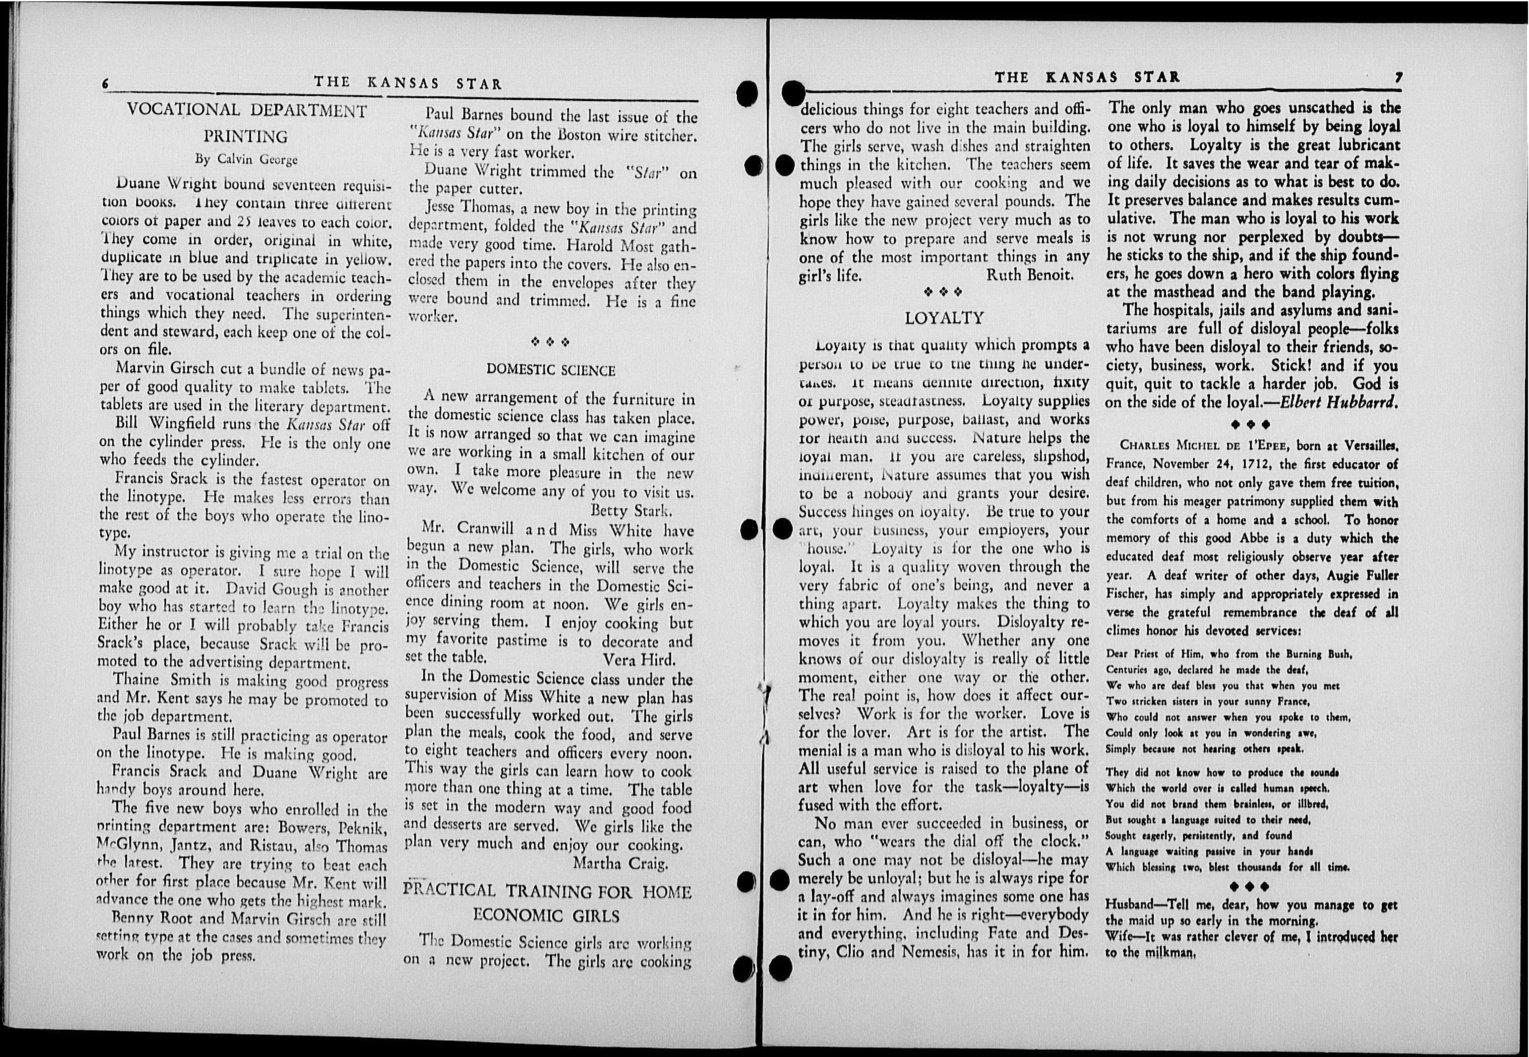 The Kansas Star, volume 52, number 6 - 6-7